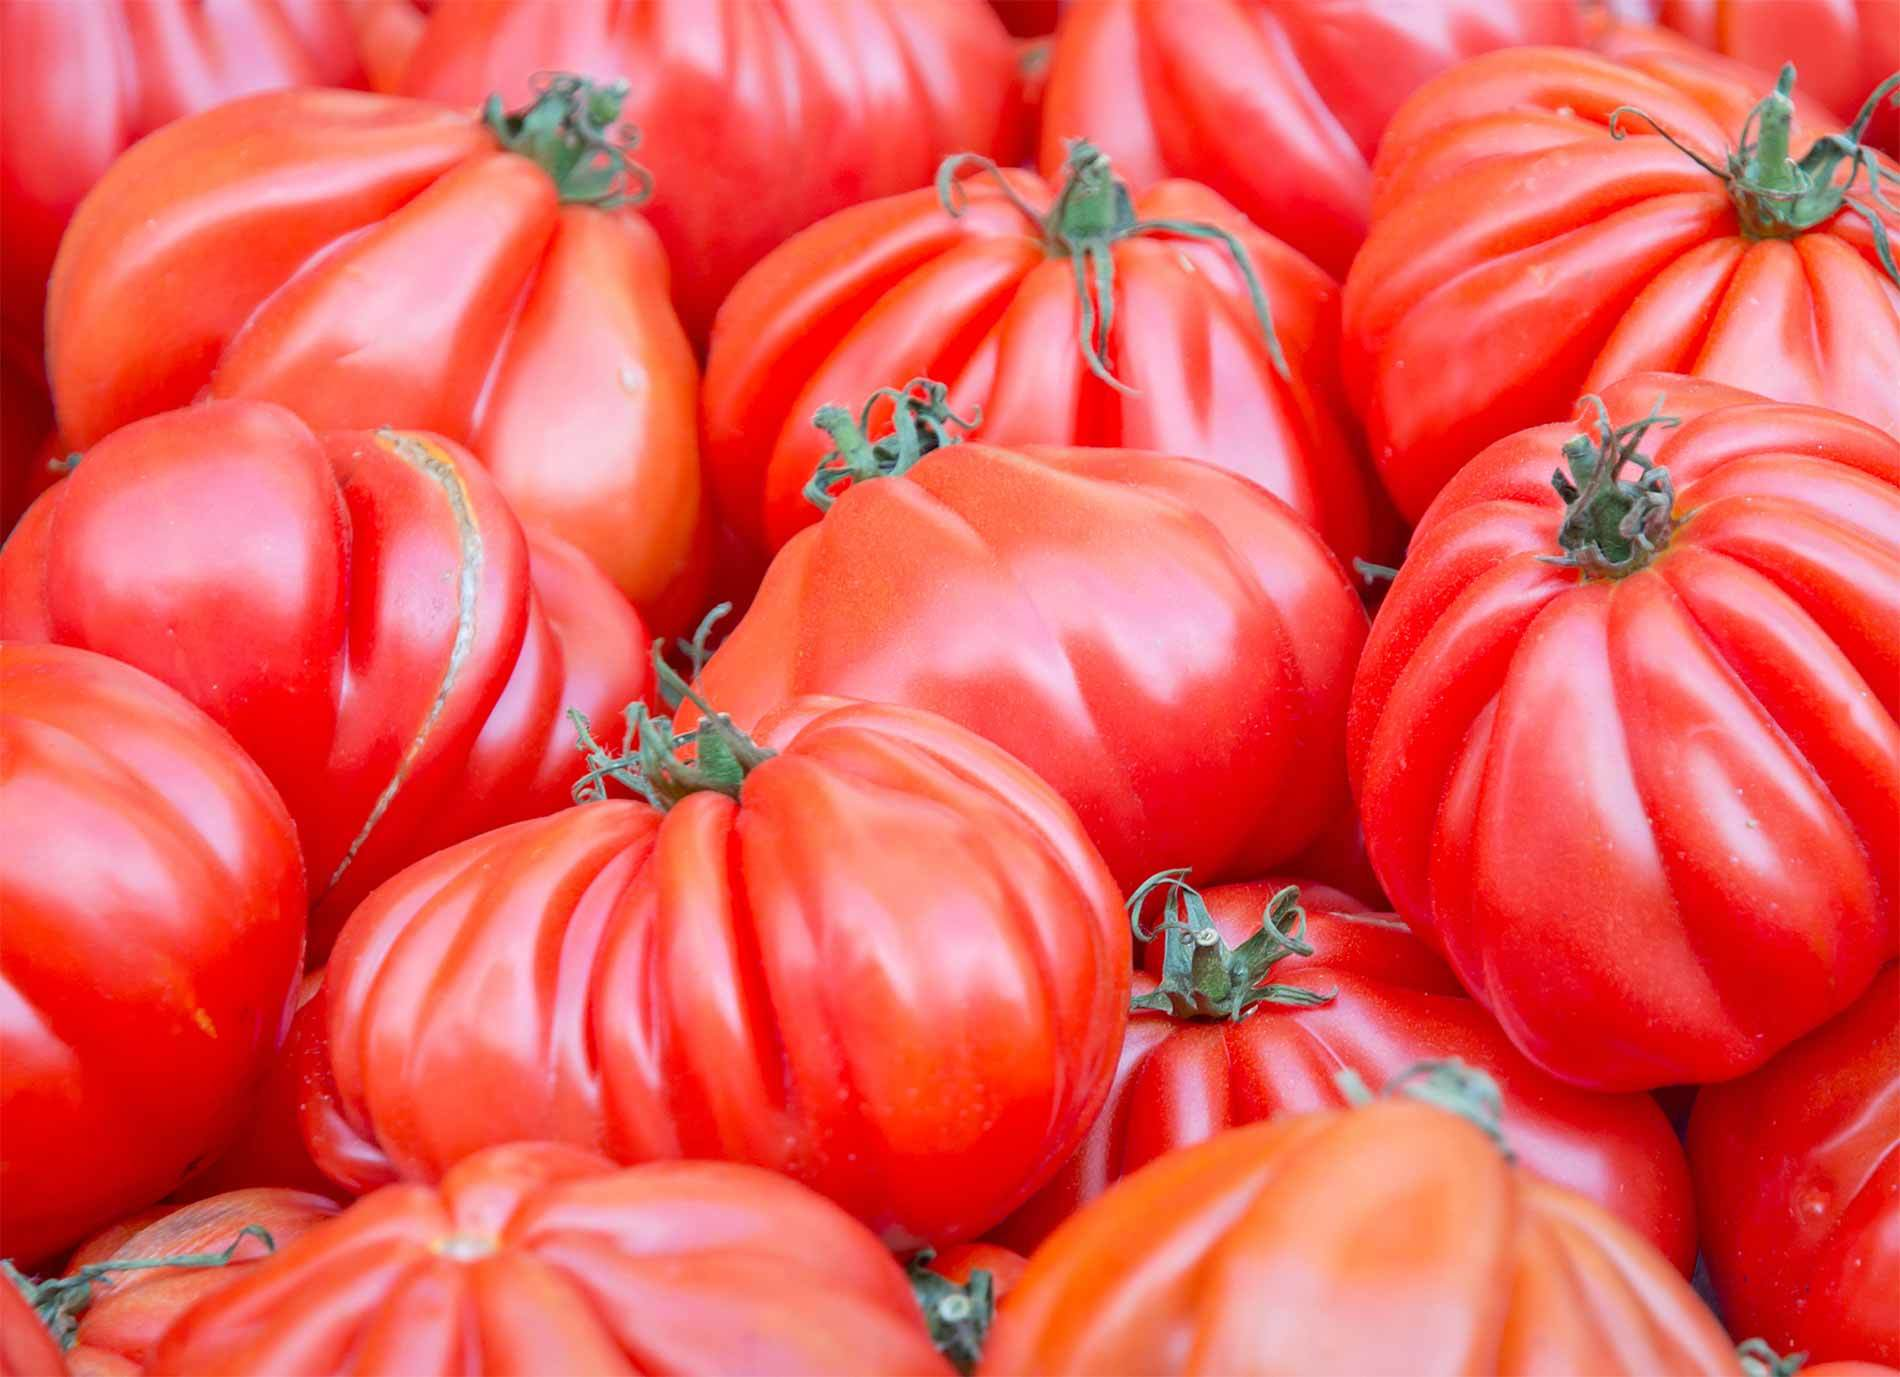 Tomatoes Market 1